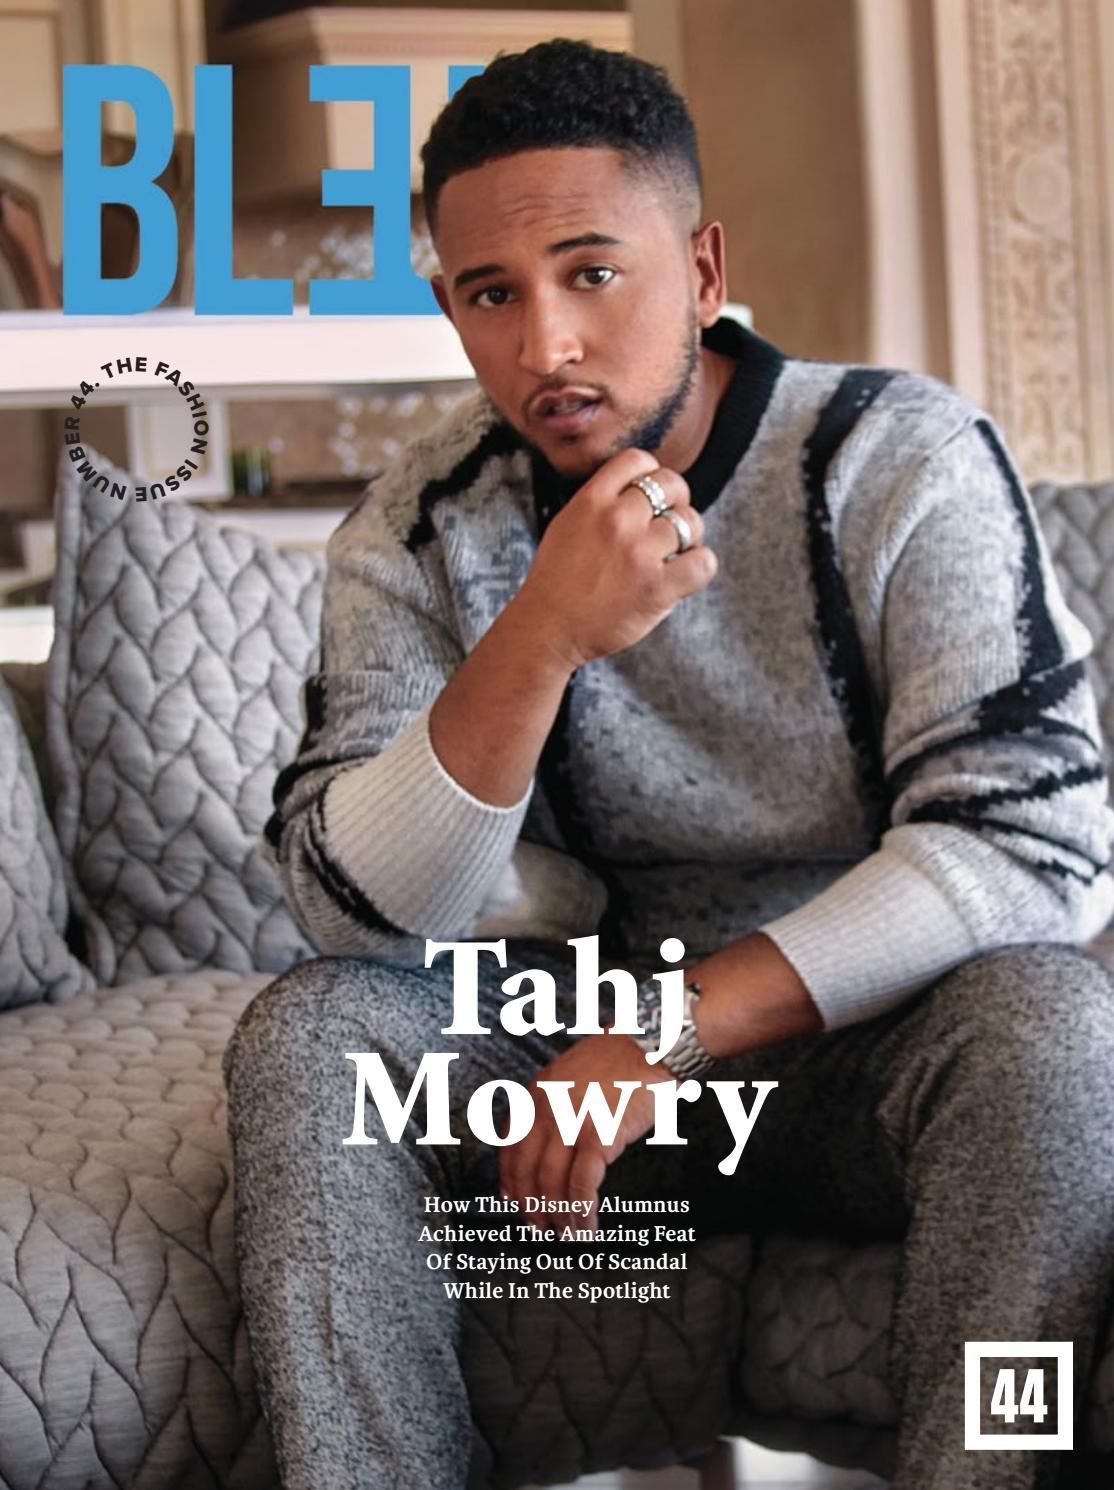 Bleu Magazine Issue 44- Tahj Mowry by Bleu Magazine - issuu